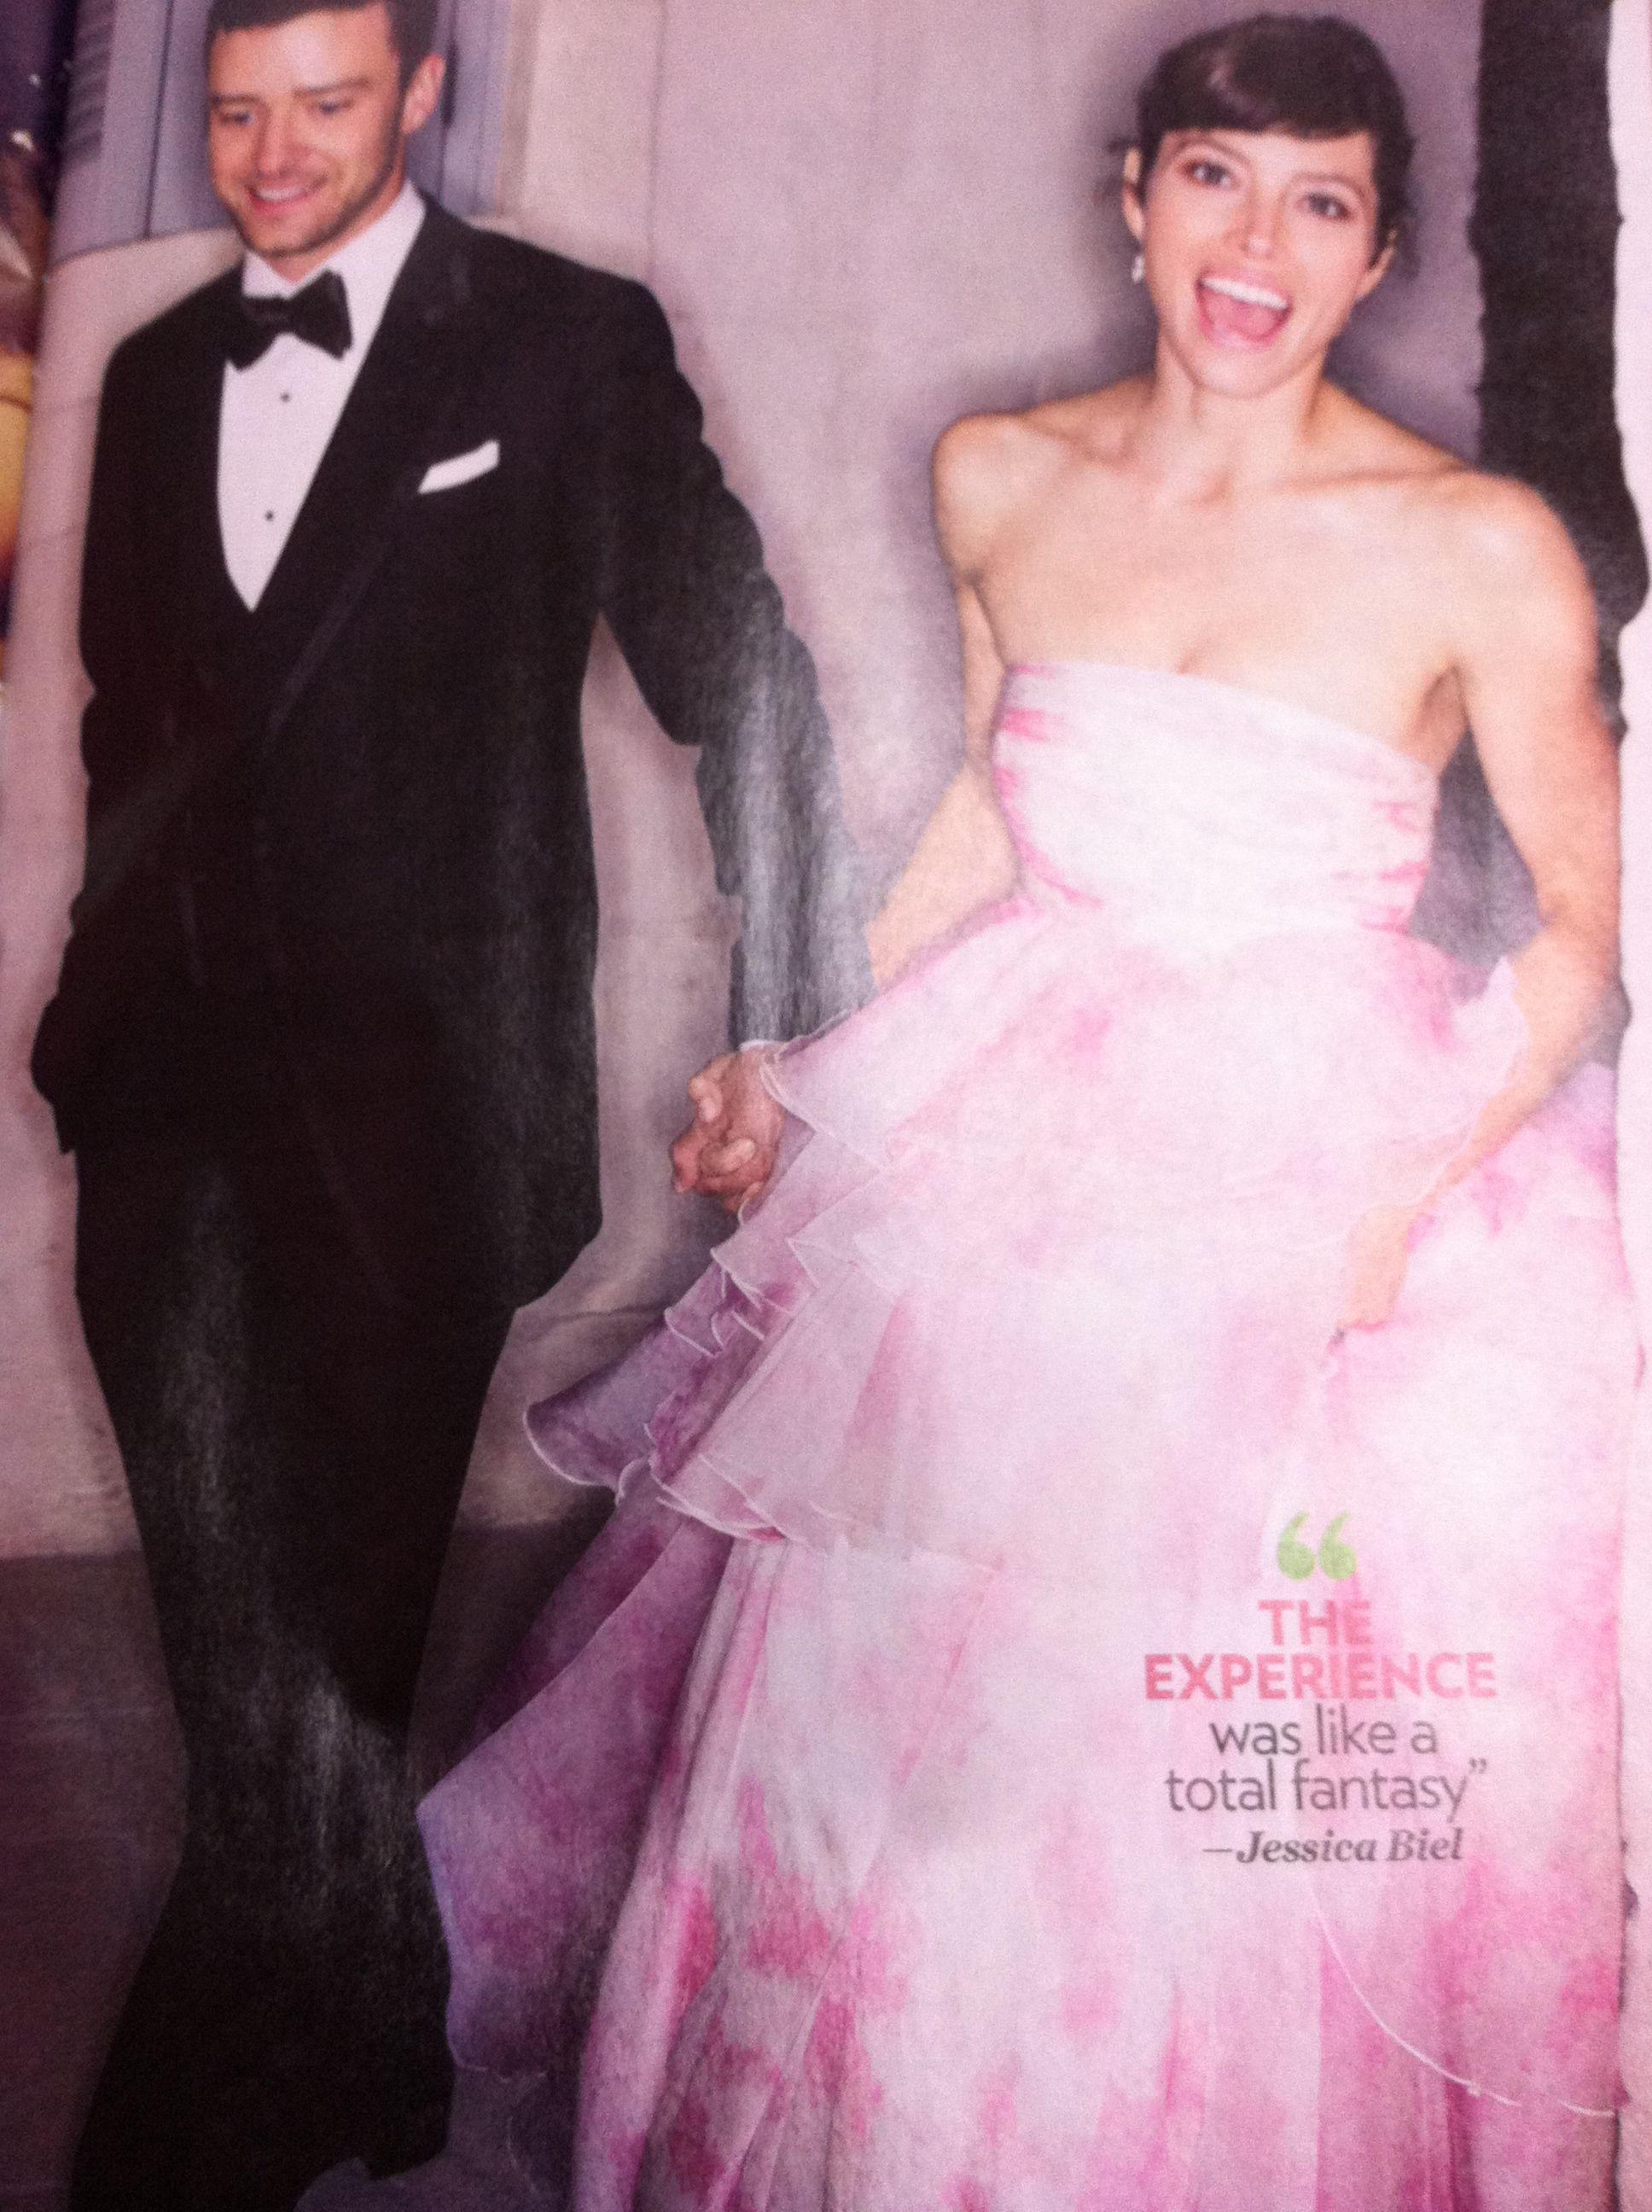 Image Detail For Jessica Biel Dons Pink Wedding Dress Cameo Blog Jessica Biel Wedding Dress Celebrity Bride Celebrity Wedding Dresses